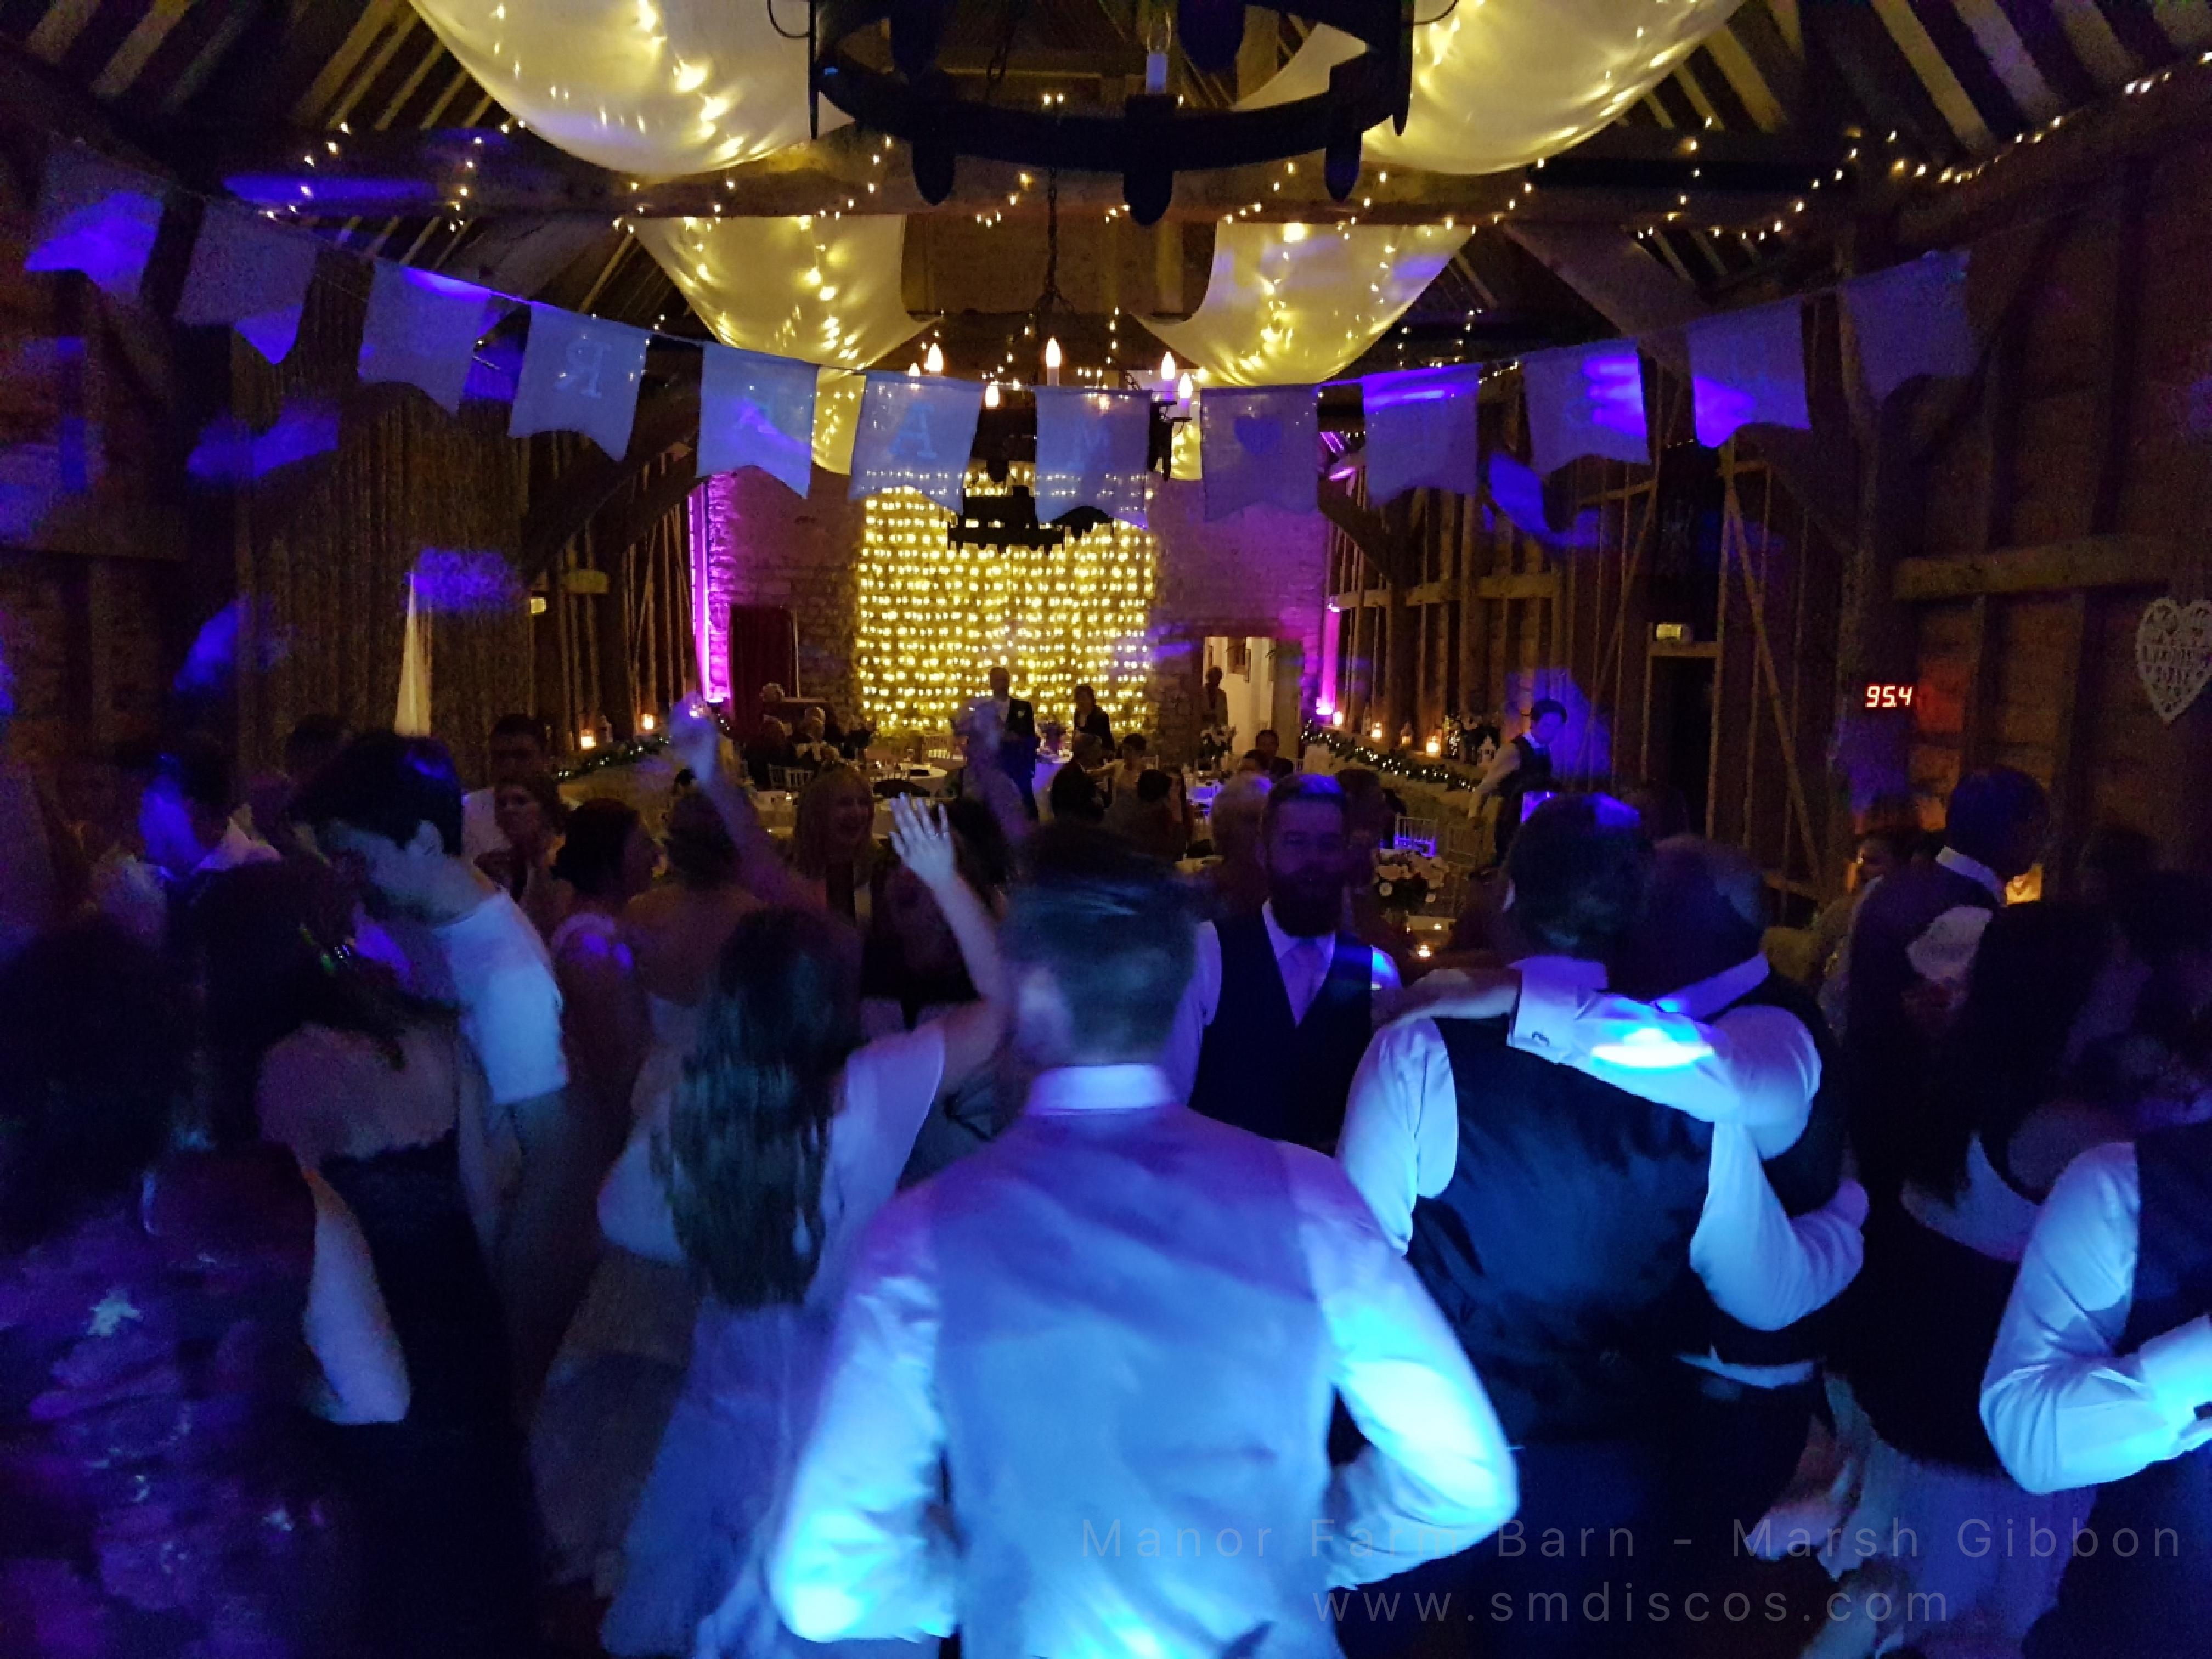 wedding disco manor farm barn